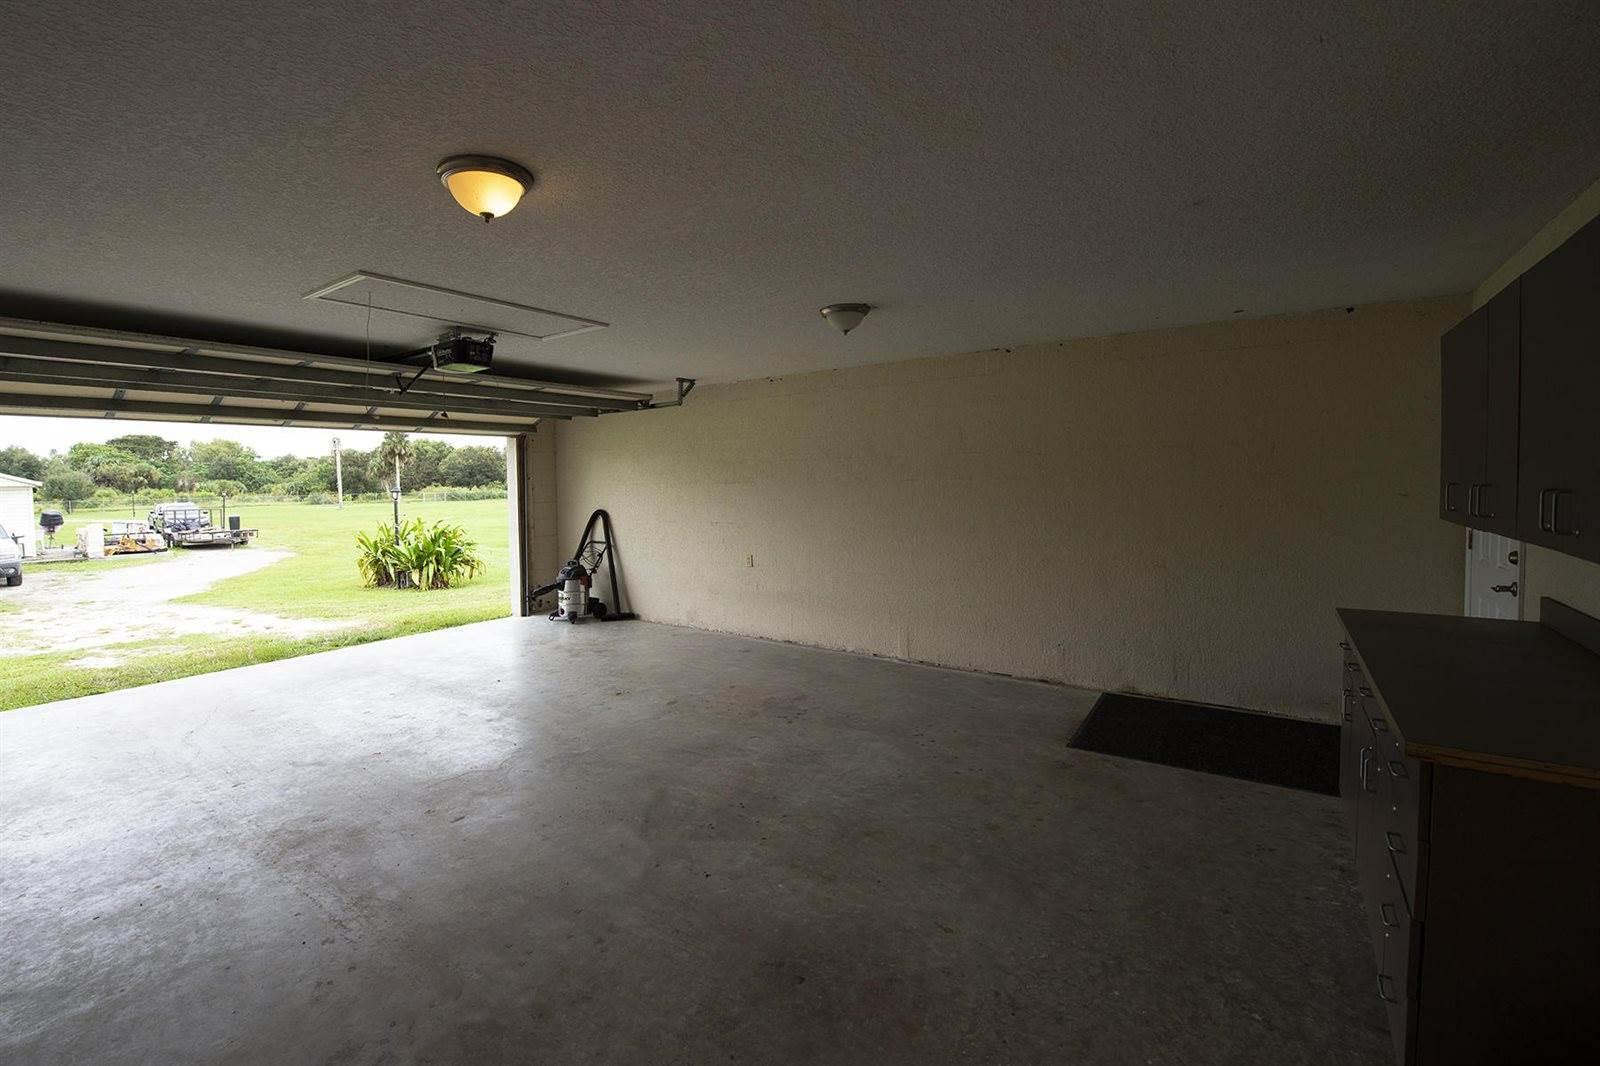 12450 Us Highway 441 SE, Okeechobee, FL 34974